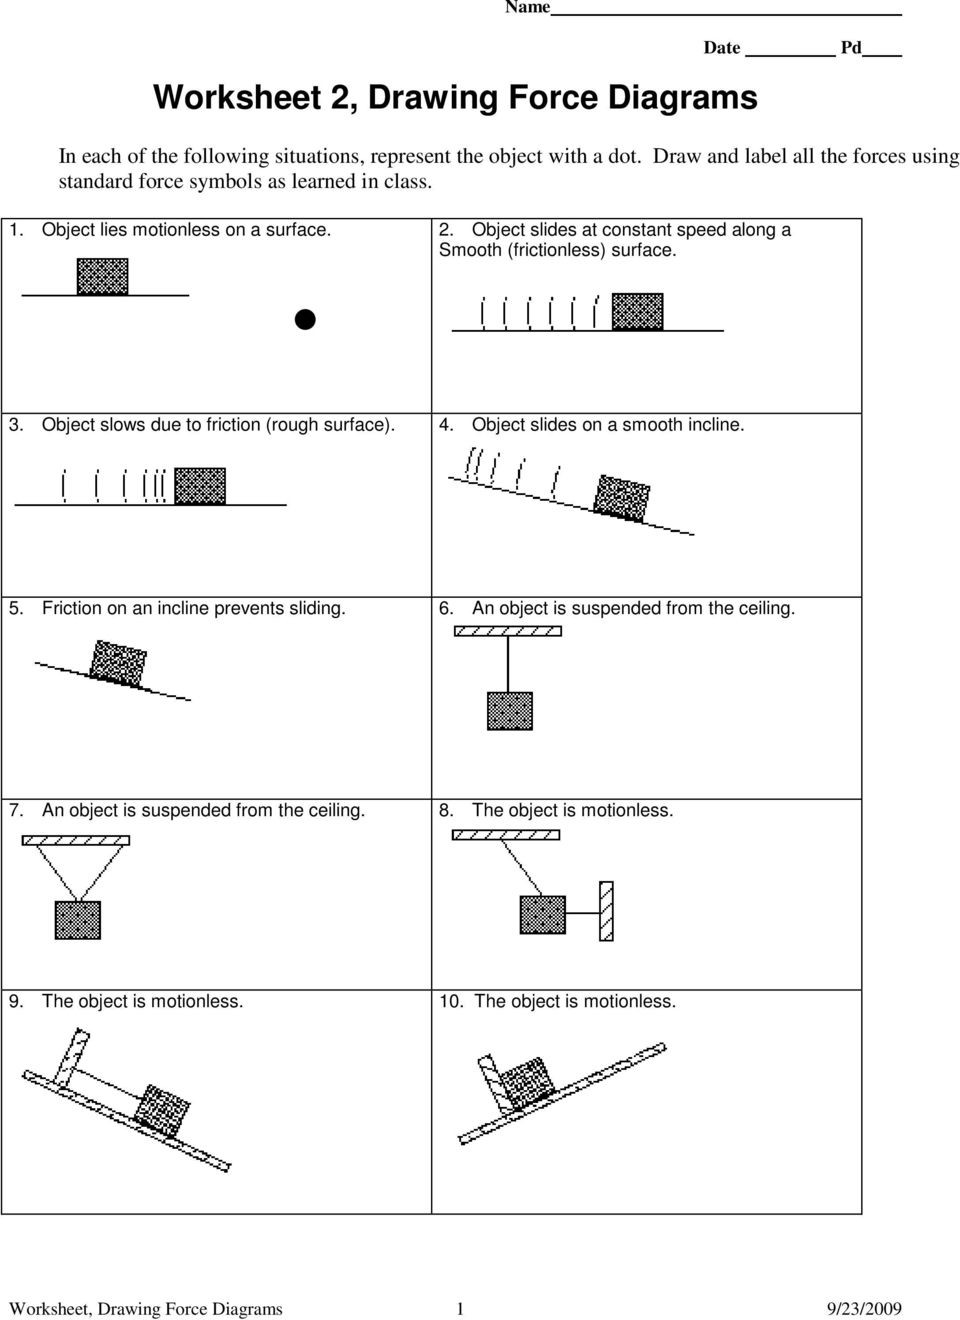 Forces Worksheet 1 Answer Key Worksheet 1 Free Body or force Diagrams Pdf Free Download